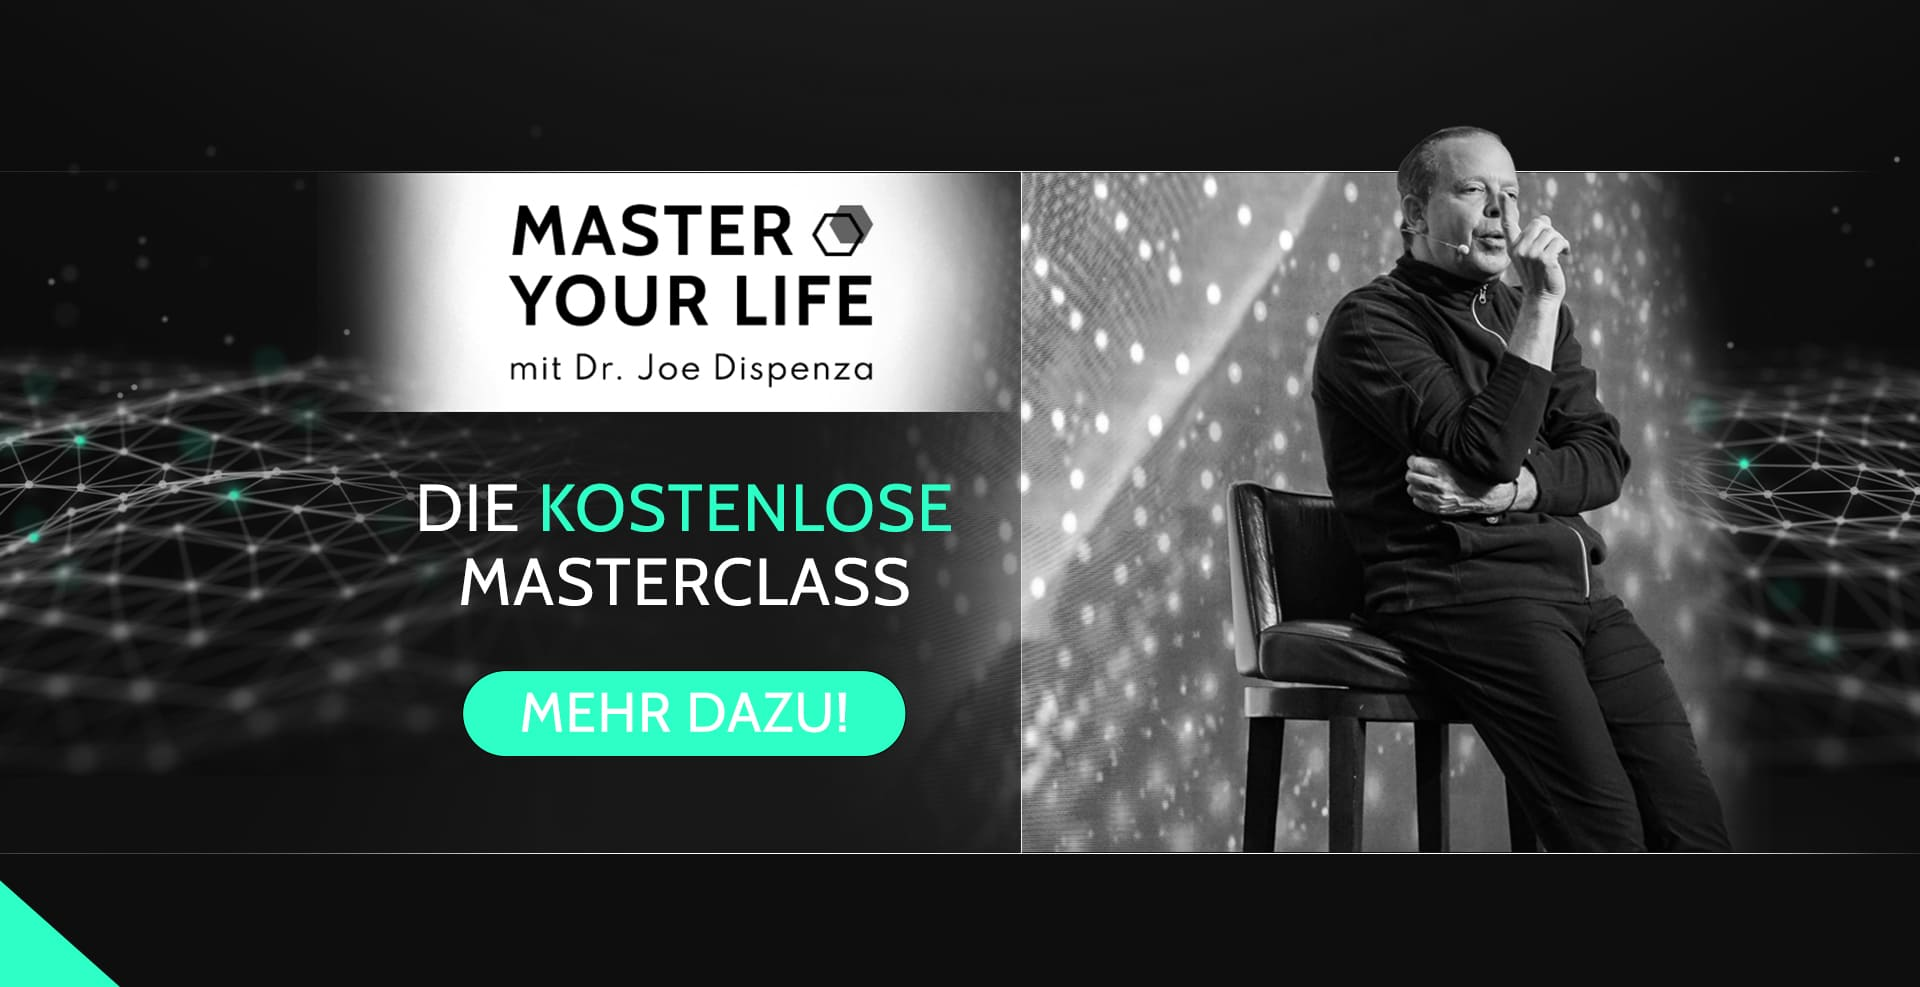 Dr. Joe Dispenza Master Your Life Masterclass